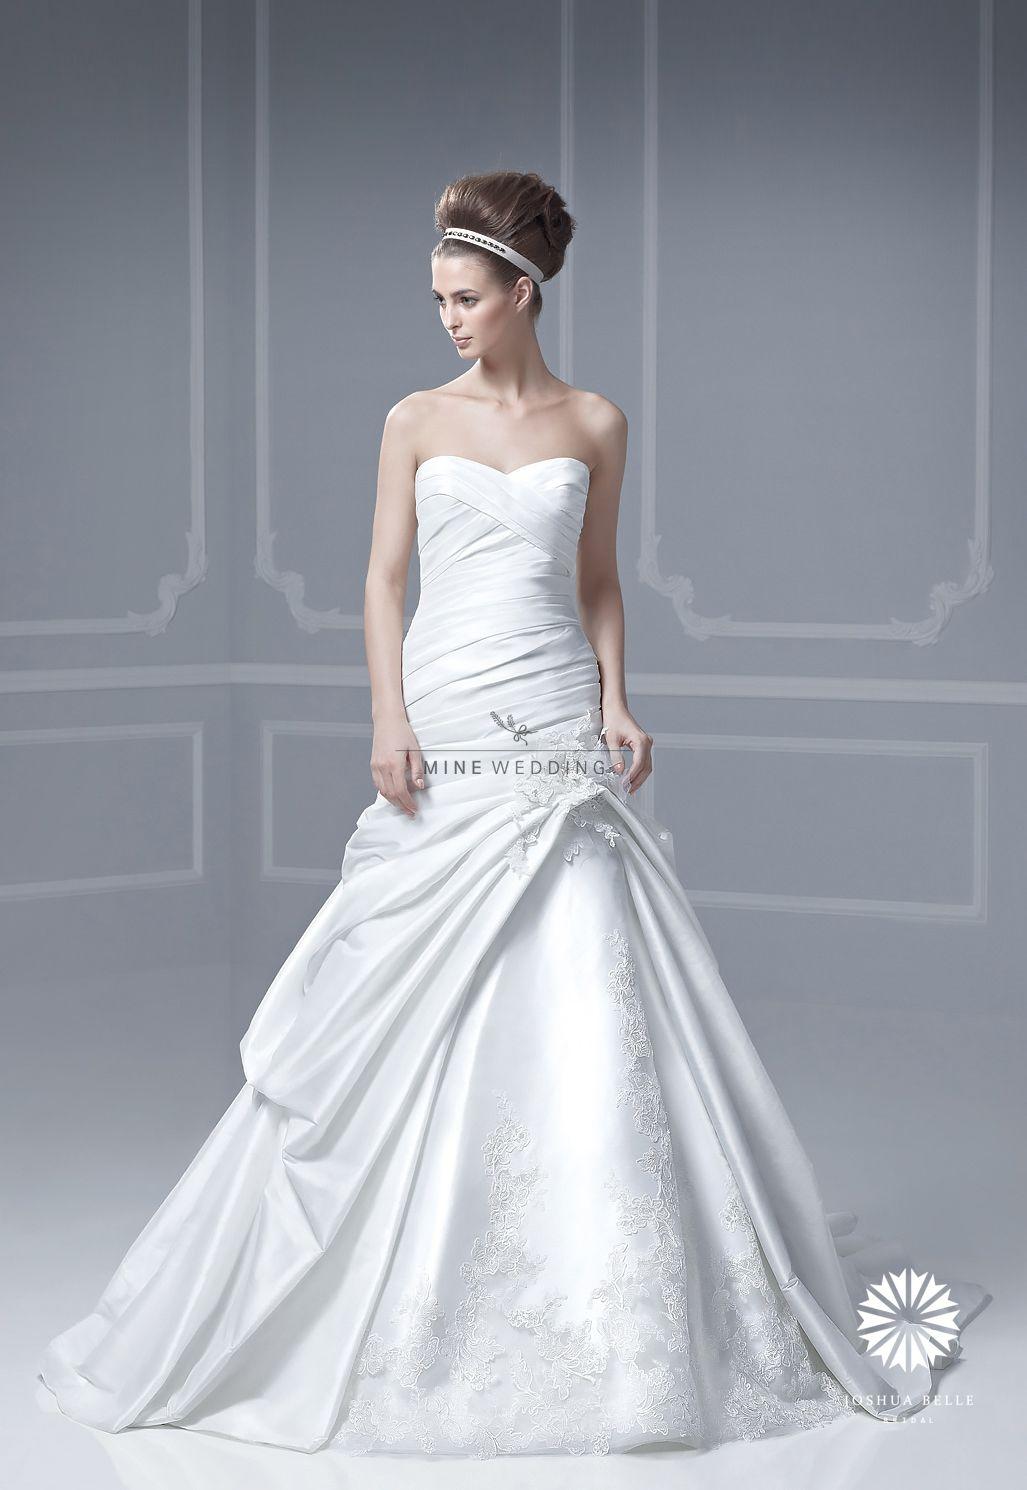 Dorable Wedding Skirt Suits Illustration - All Wedding Dresses ...